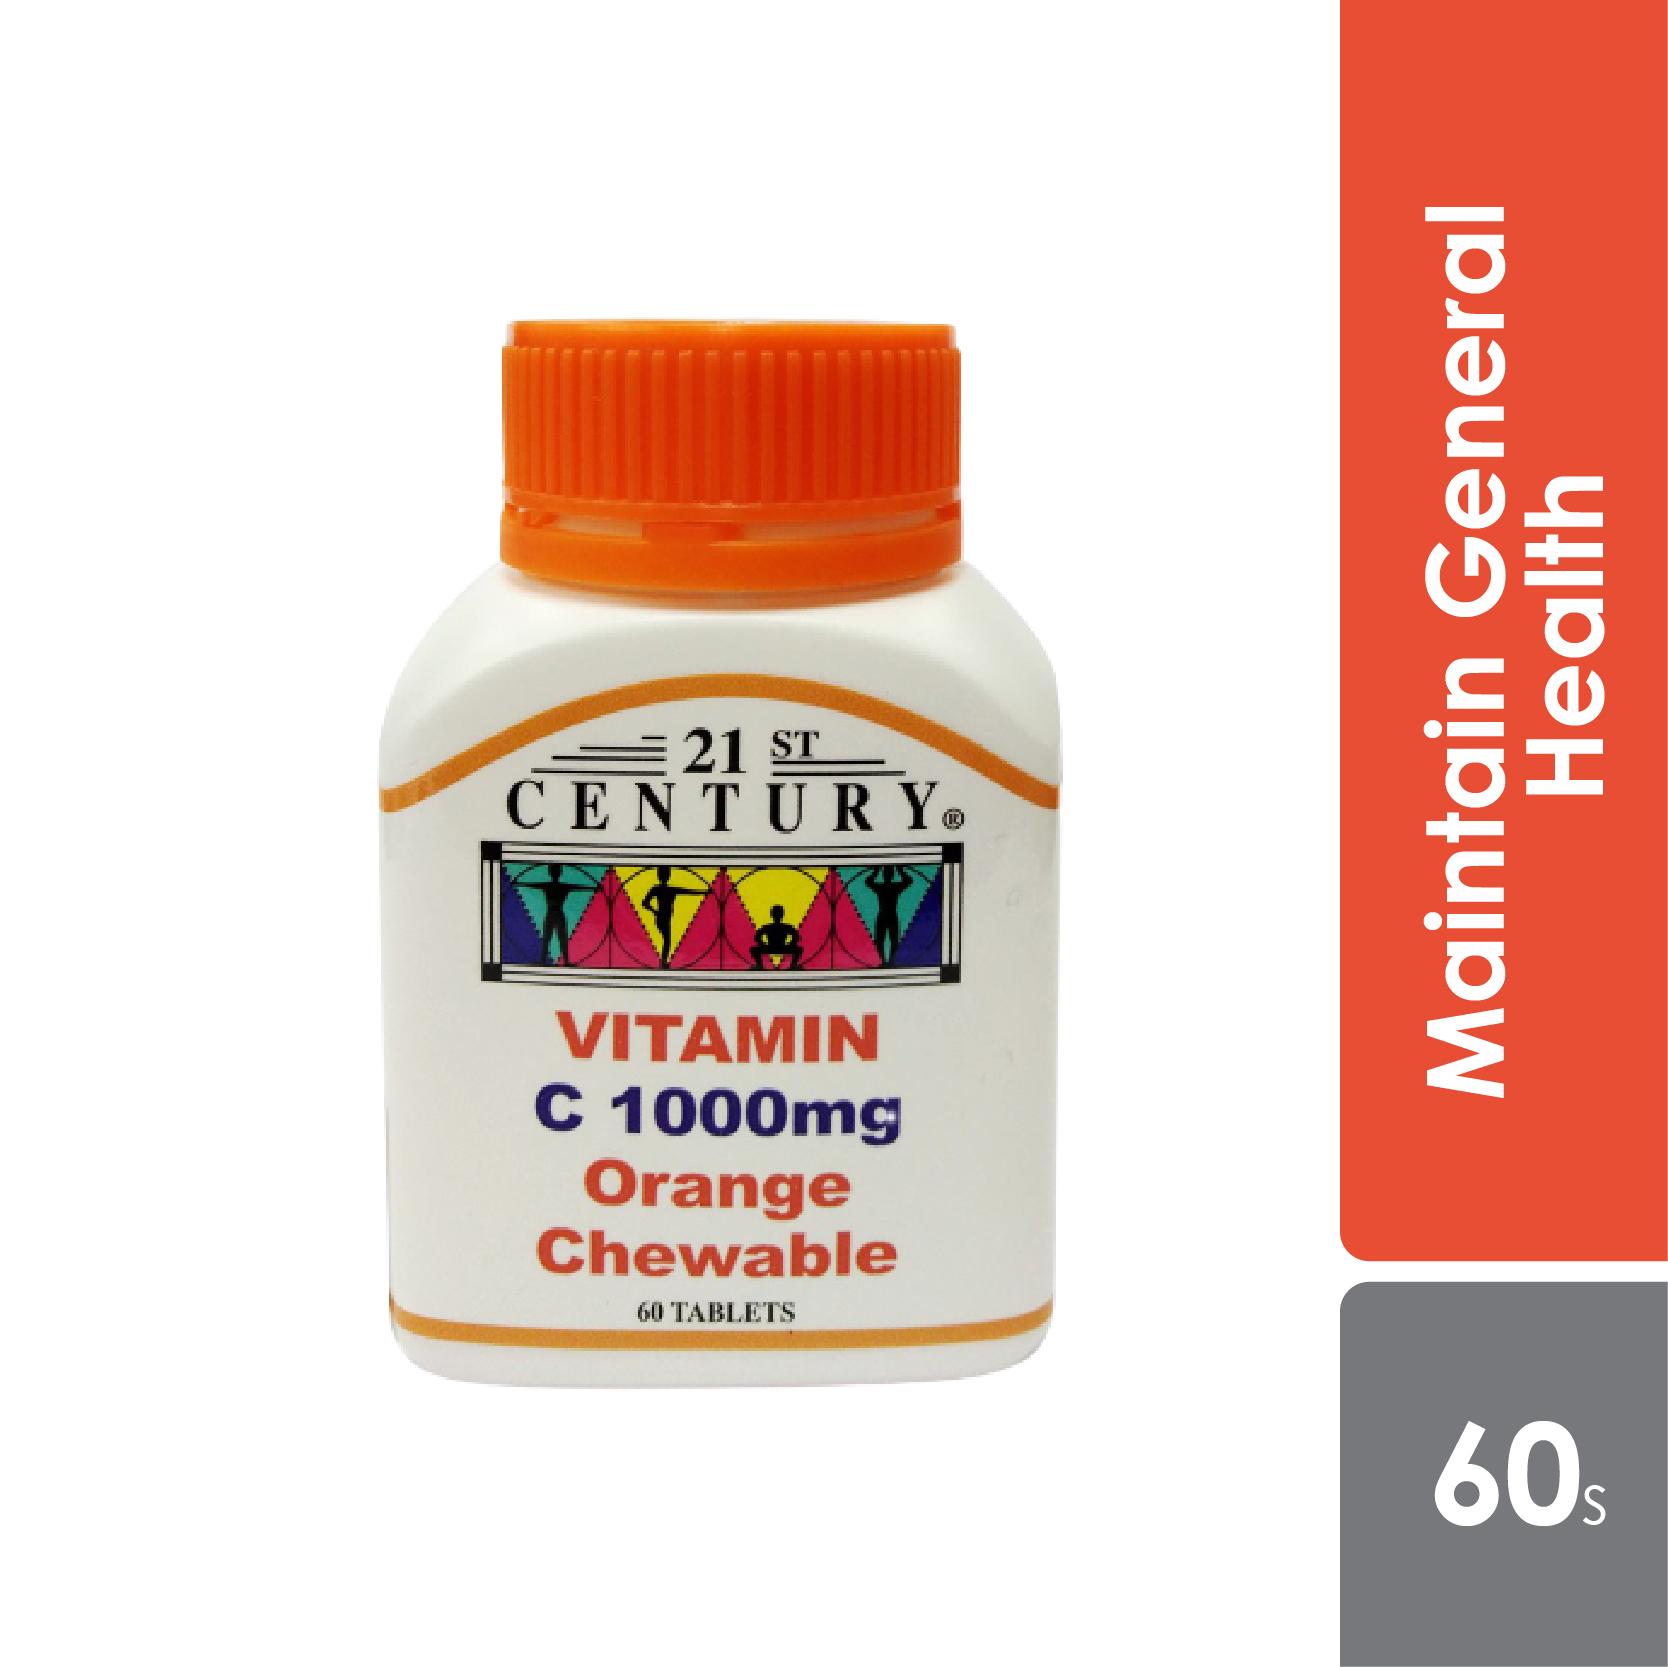 shaklee vitamin C,21st century vitamin C,pengambilan vitamin C